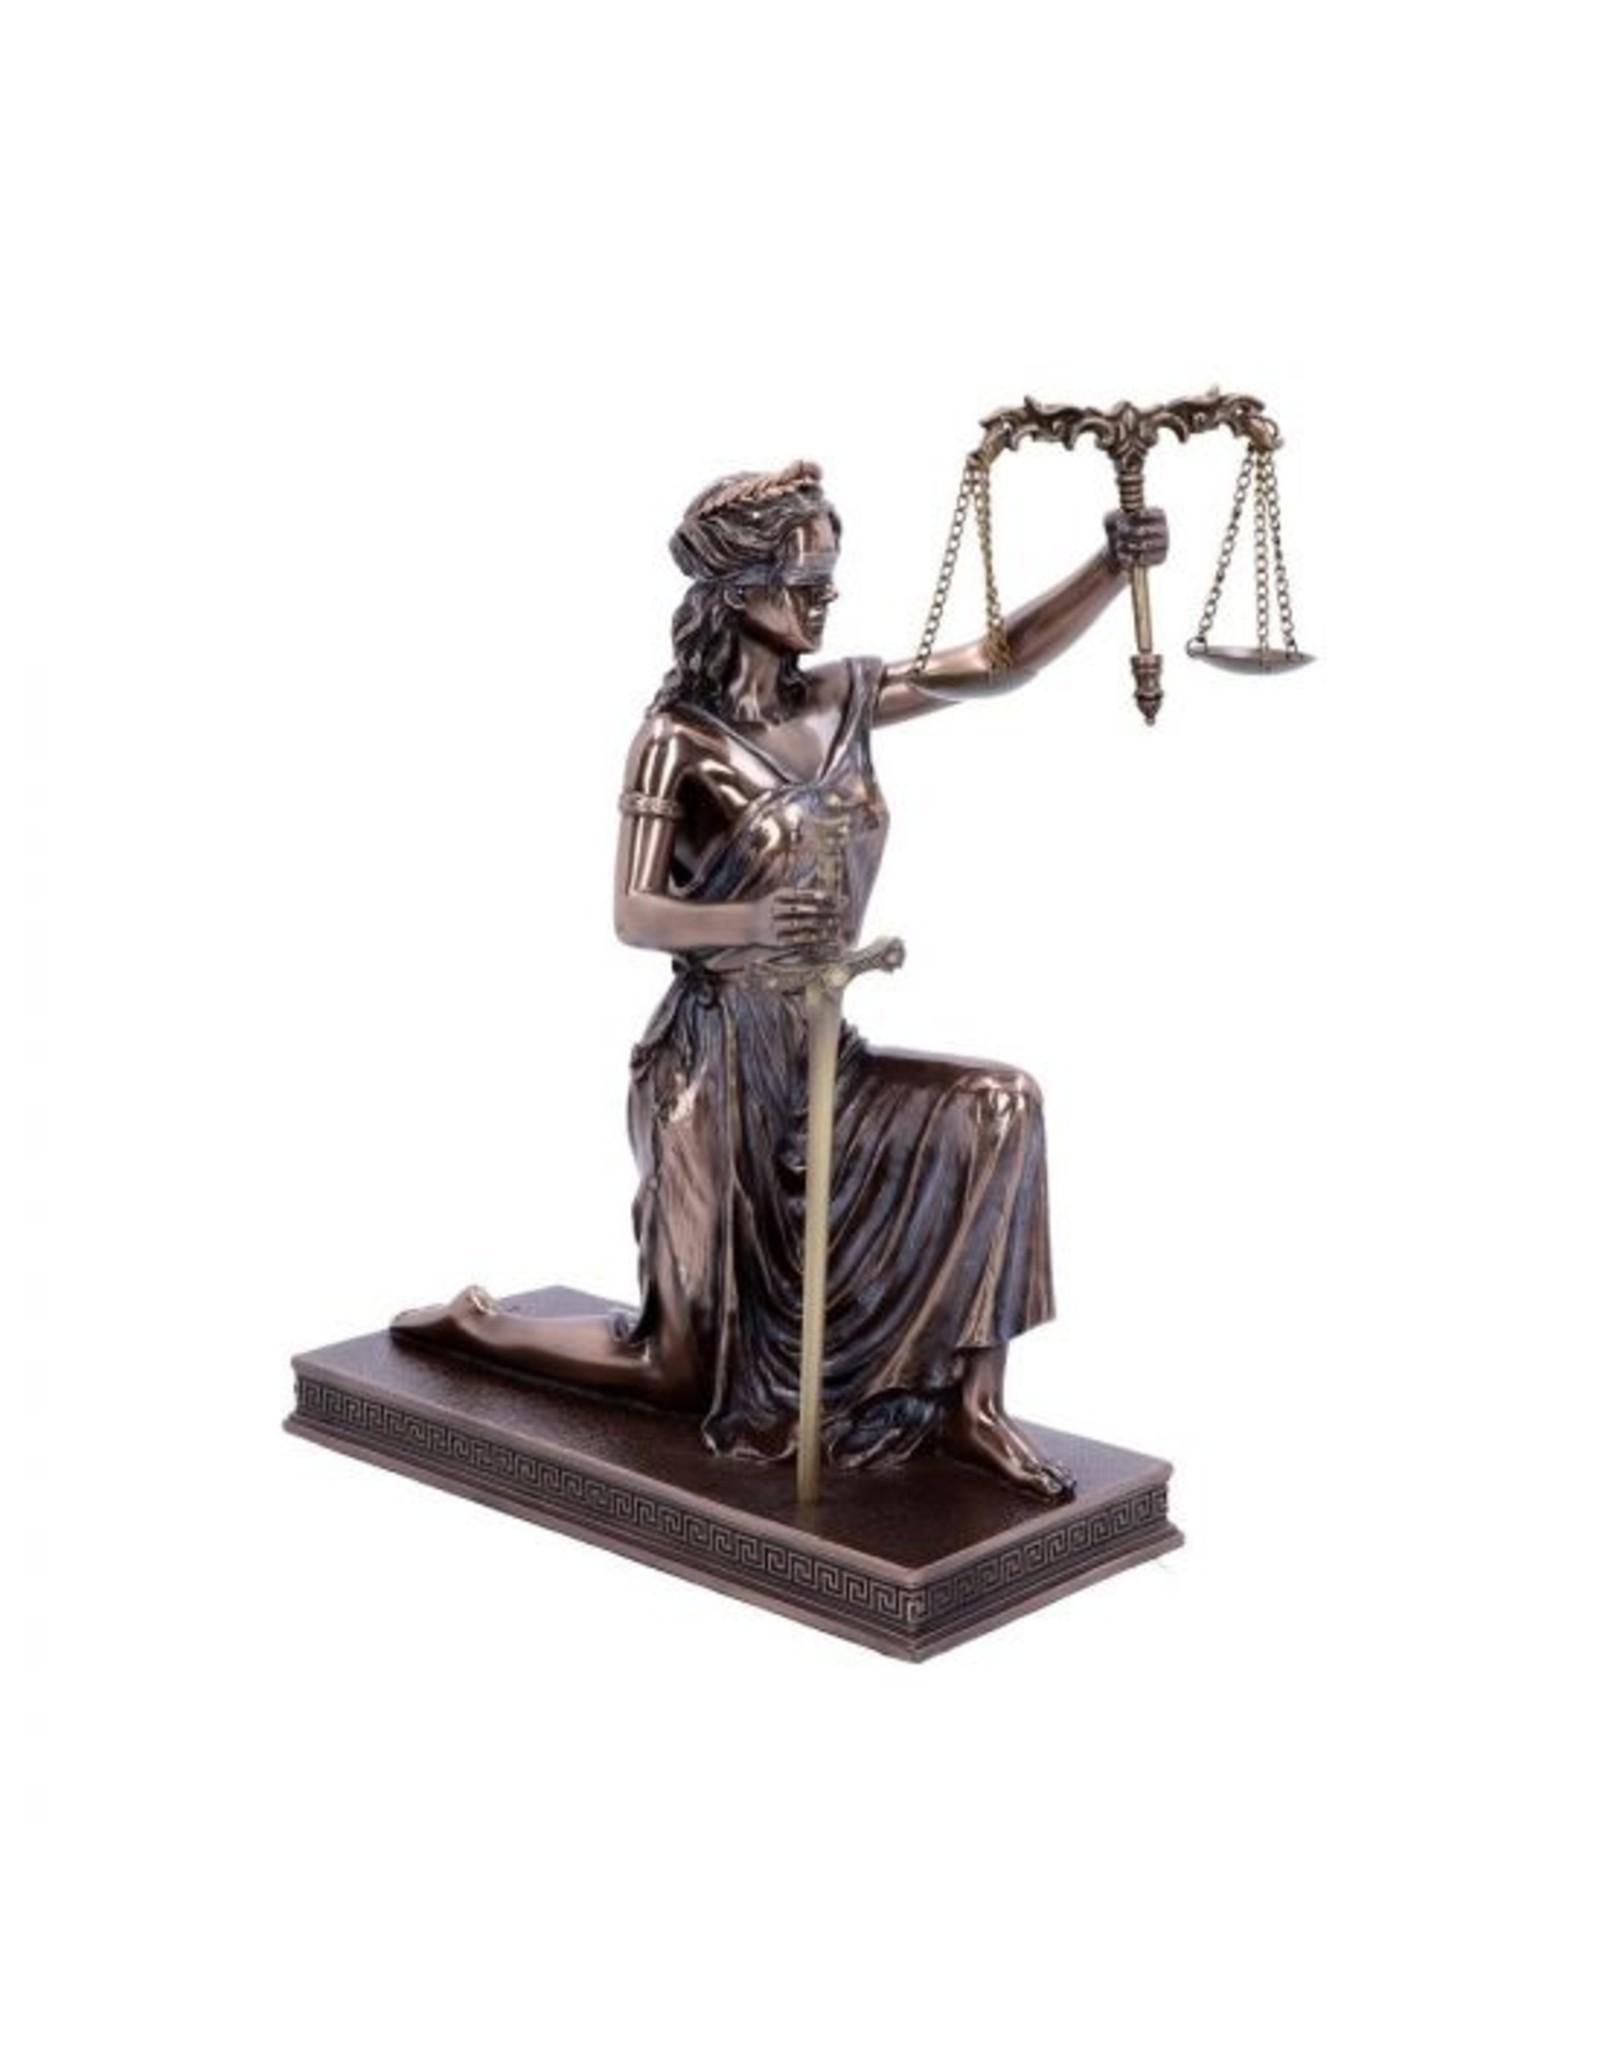 Nemesis Now Lady Justice mit Brieföffner 25 cm